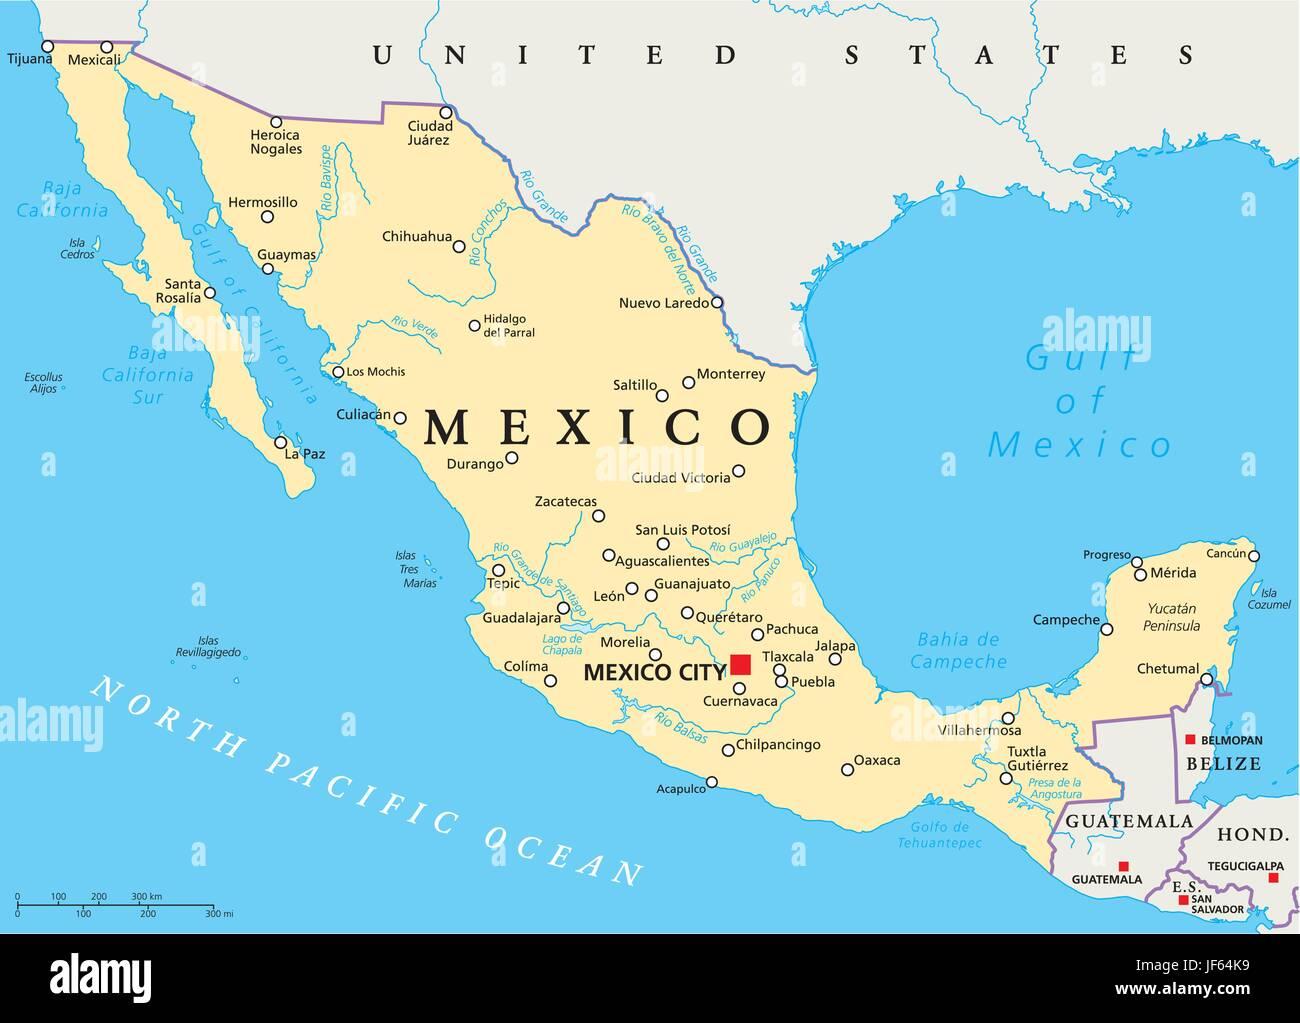 Mexiko Karte Welt.Nordamerika Karte Atlas Karte Der Welt Mexiko Amerika